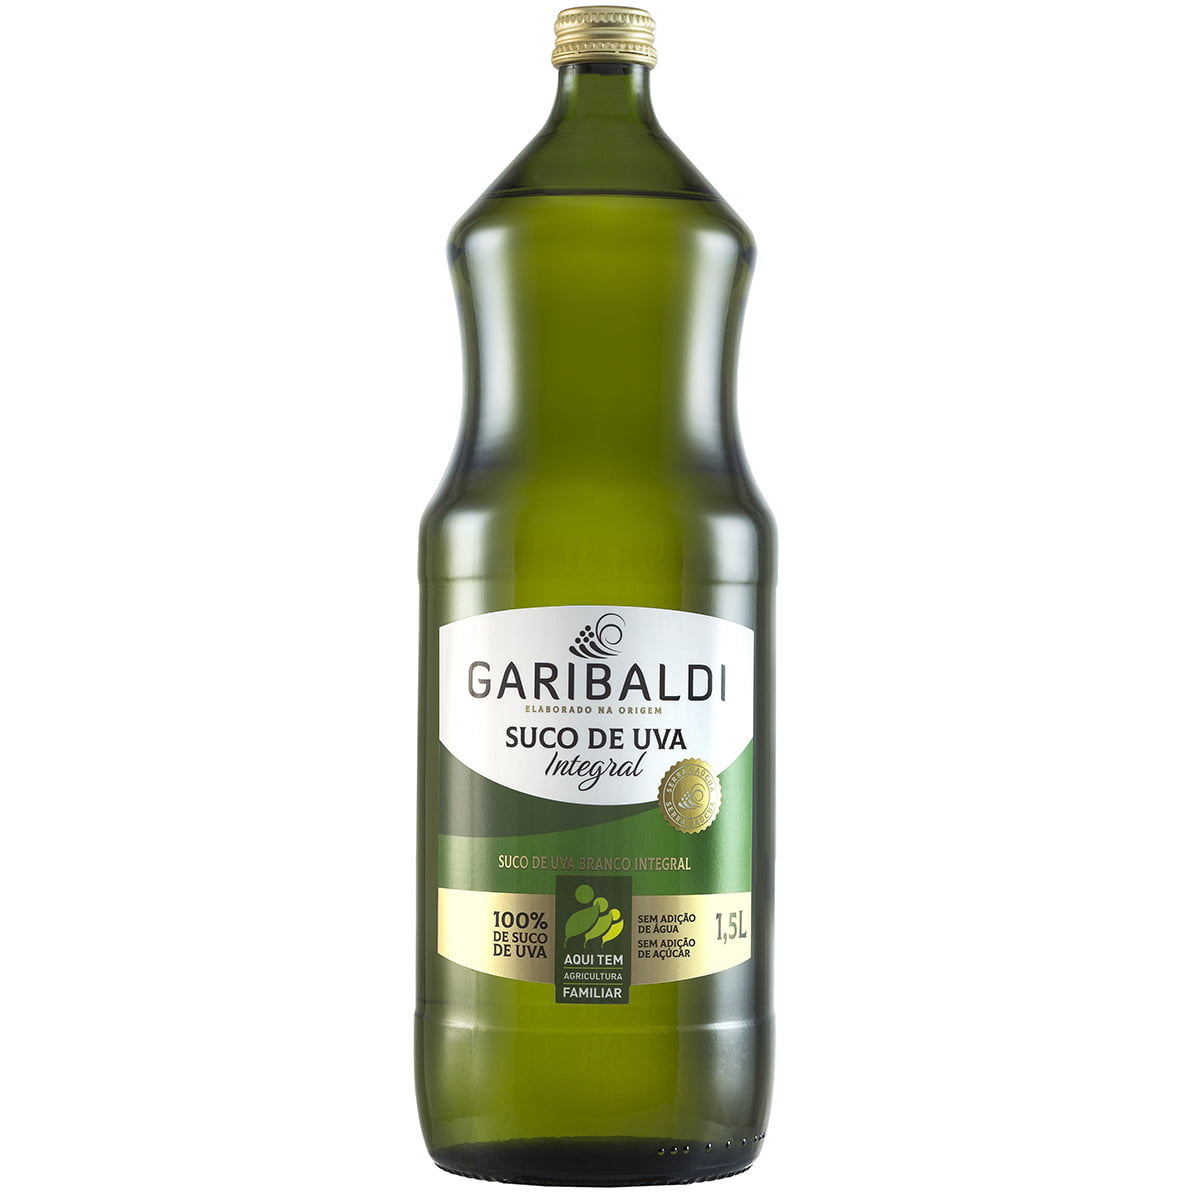 Suco de Uva Garibaldi Branco Integral 1,5 Lts